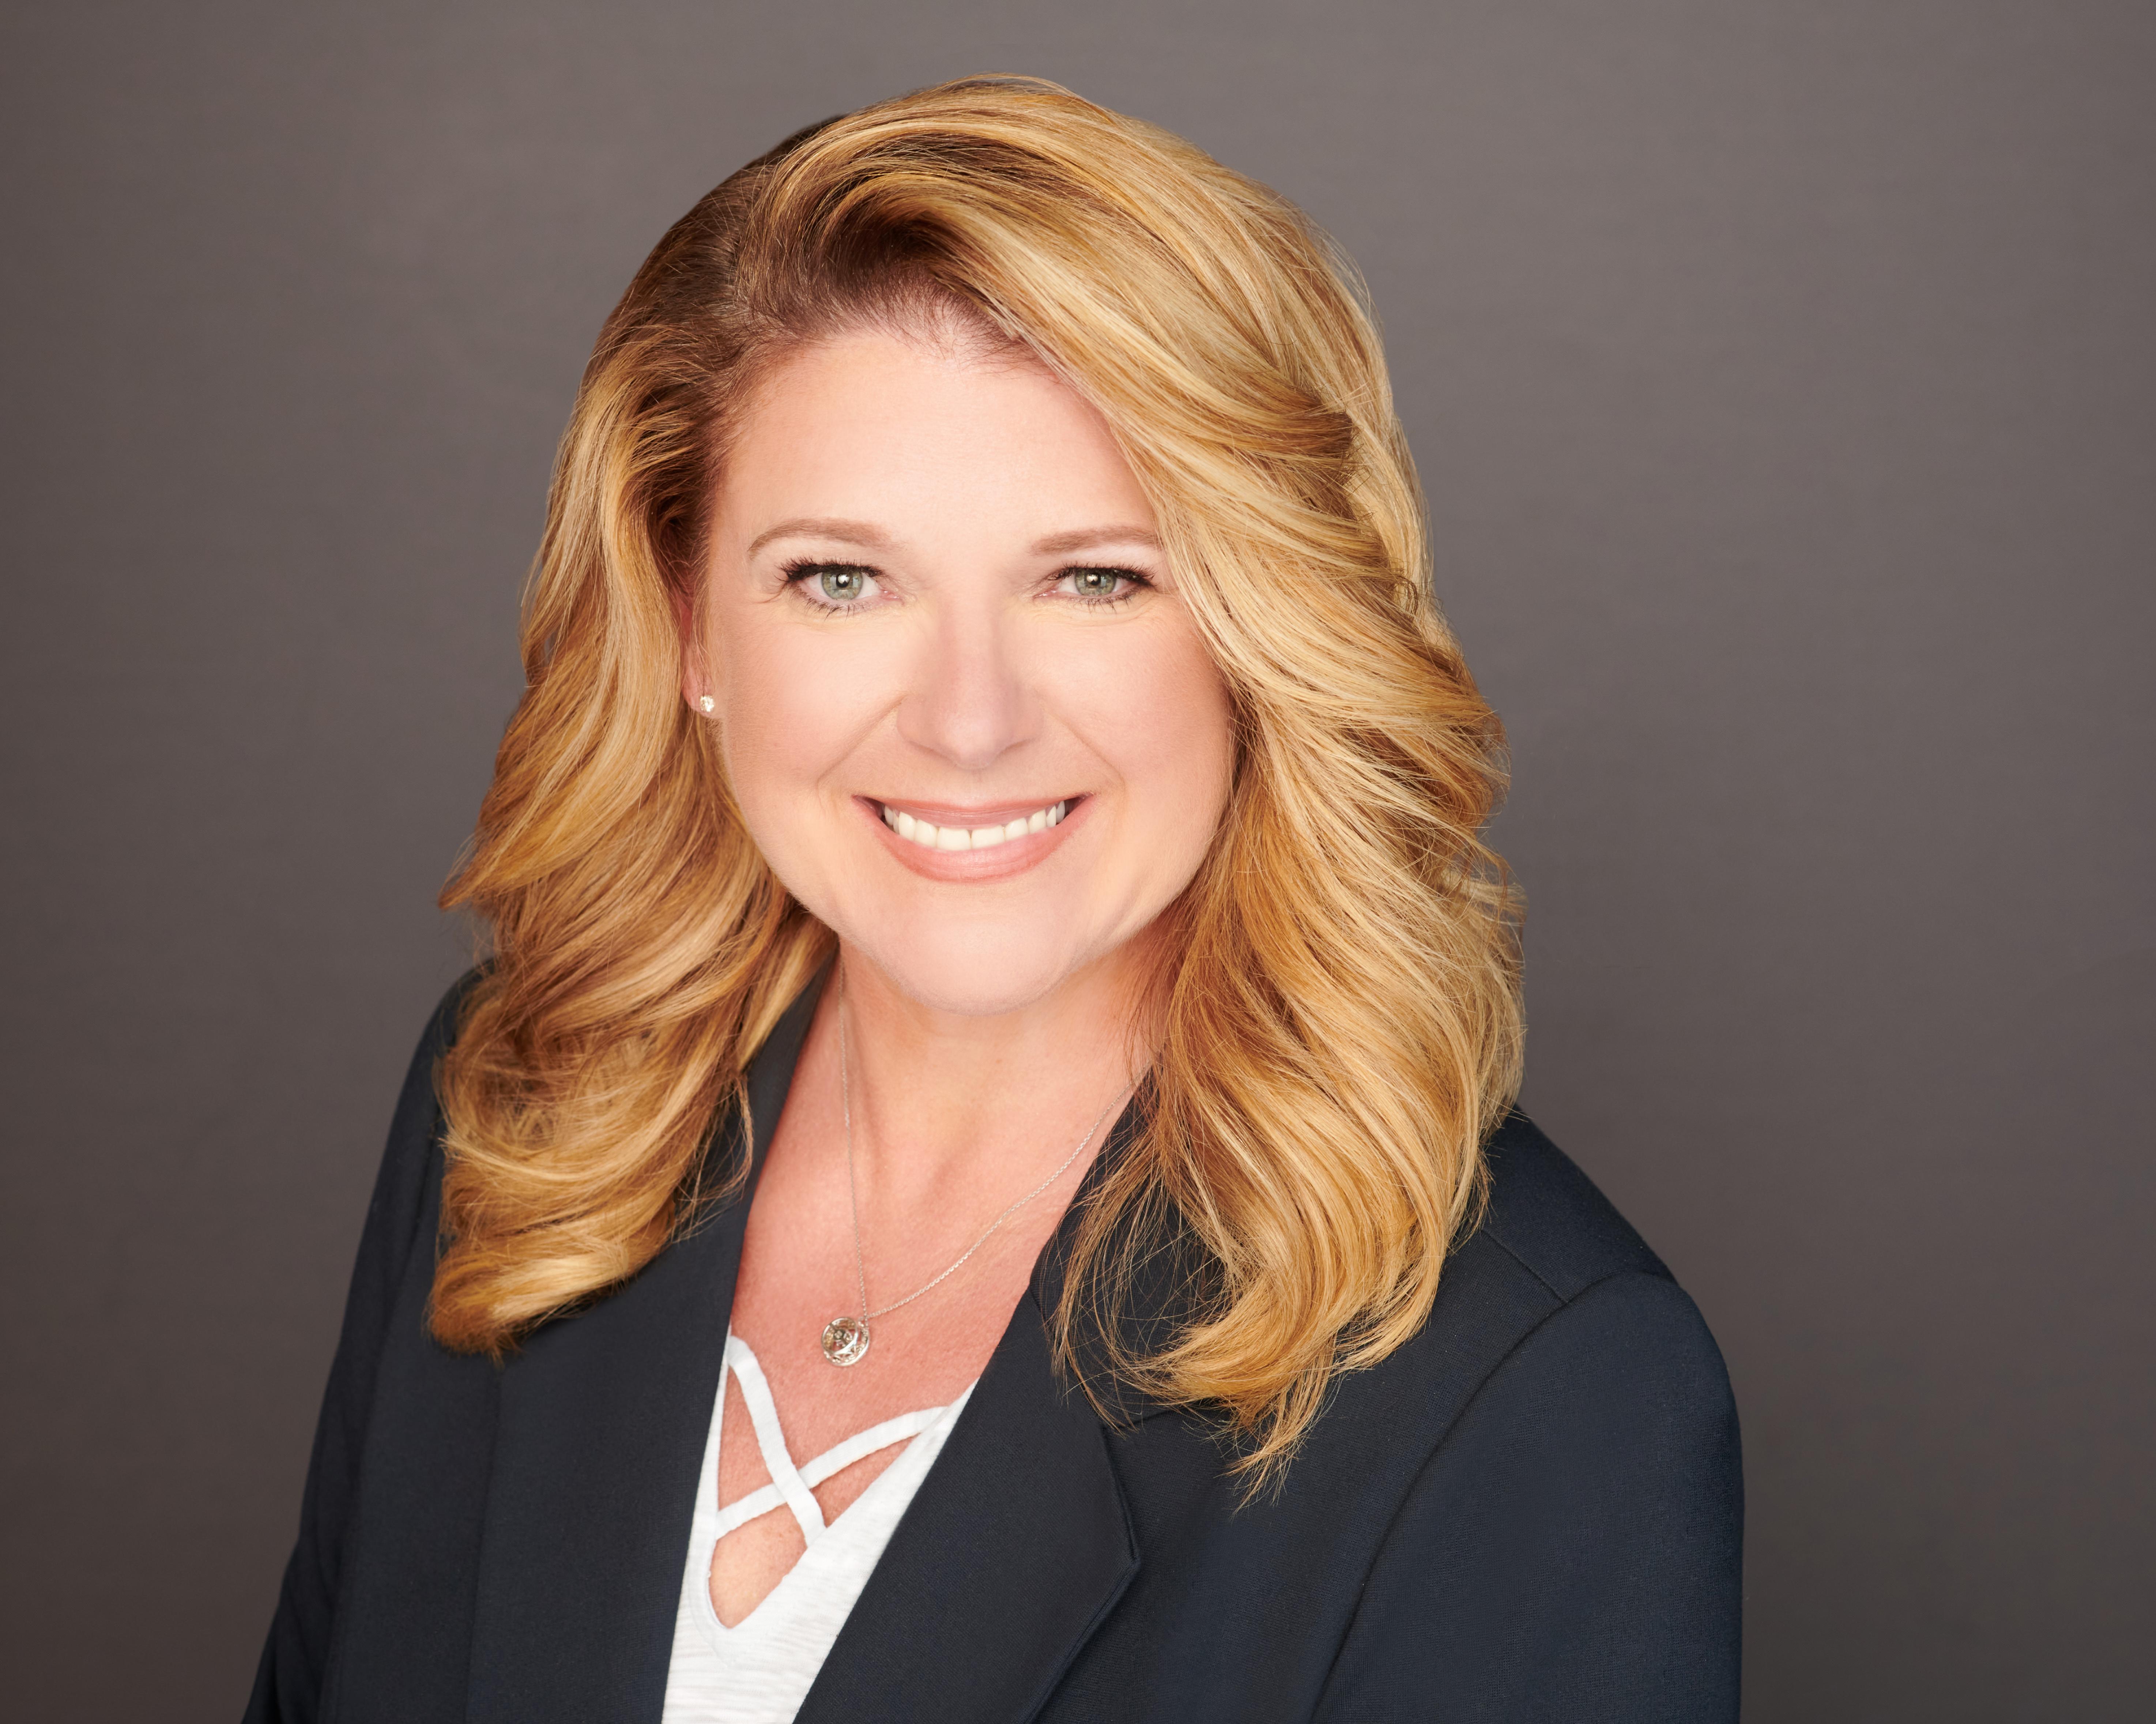 Tammy Heller, Chief Human Resources Officer, Kontoor Brands (Photo: Business Wire)